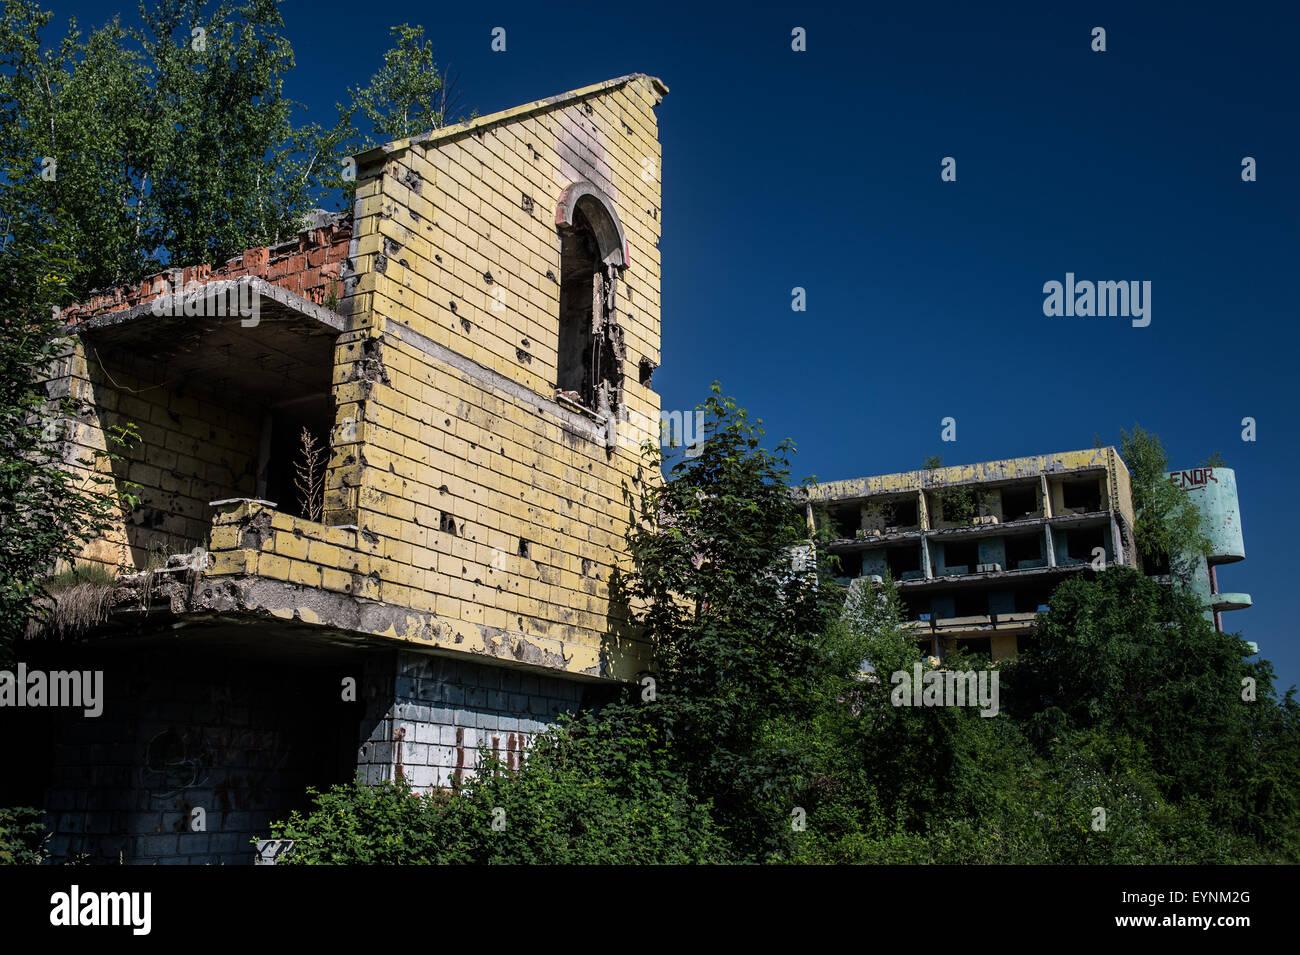 1992-95 civil war destroyed buildings, Sarajevo, Bosnia and Erzegovina Stock Photo